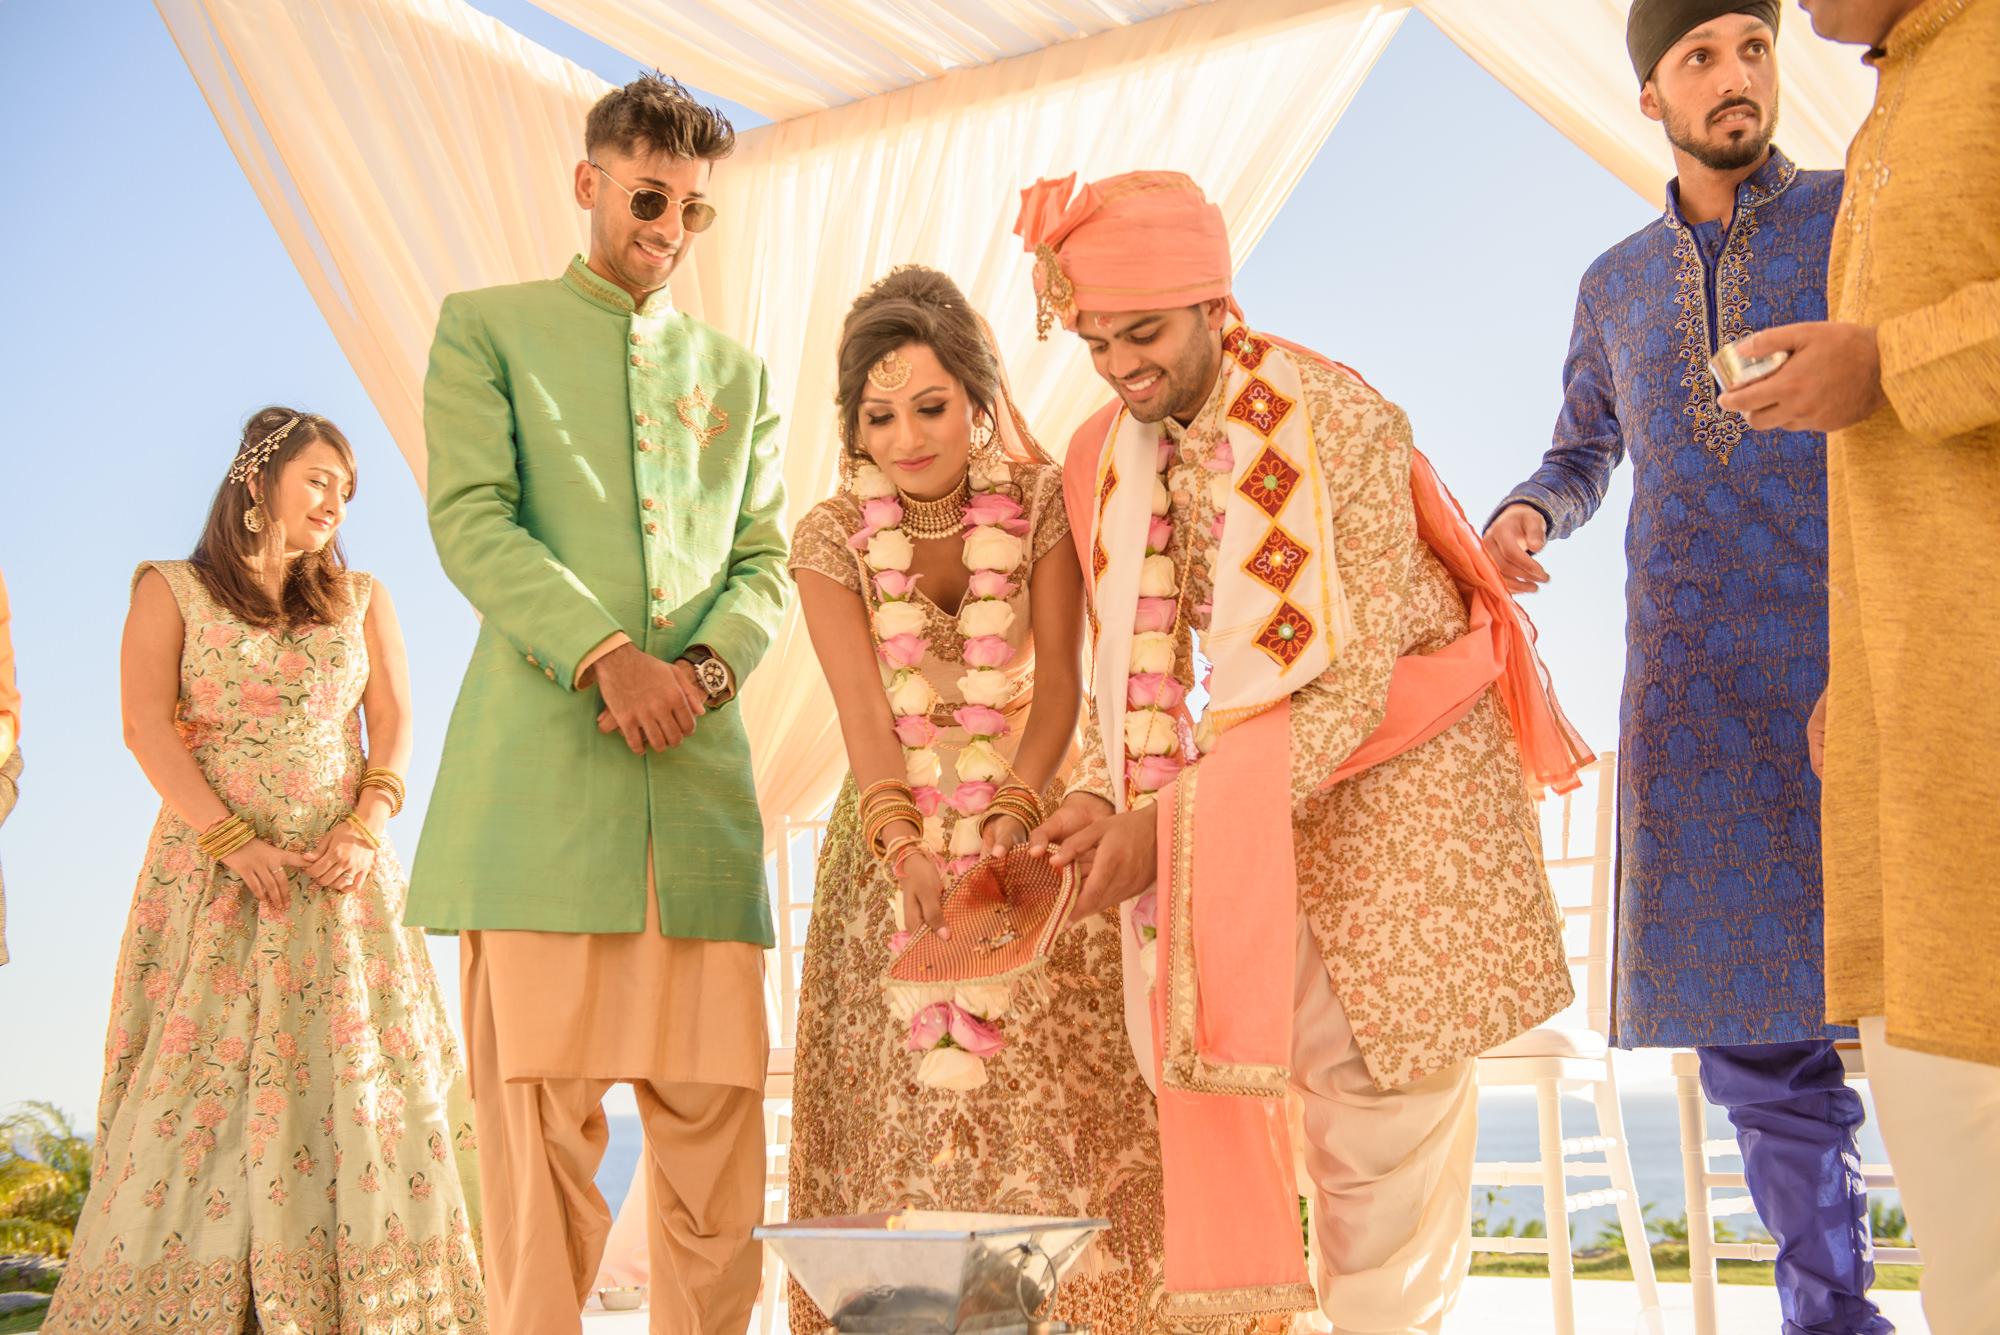 satnam photography wedding indian asian hindu destination wedding photographer tenerife ritz carlton abama-181.jpg